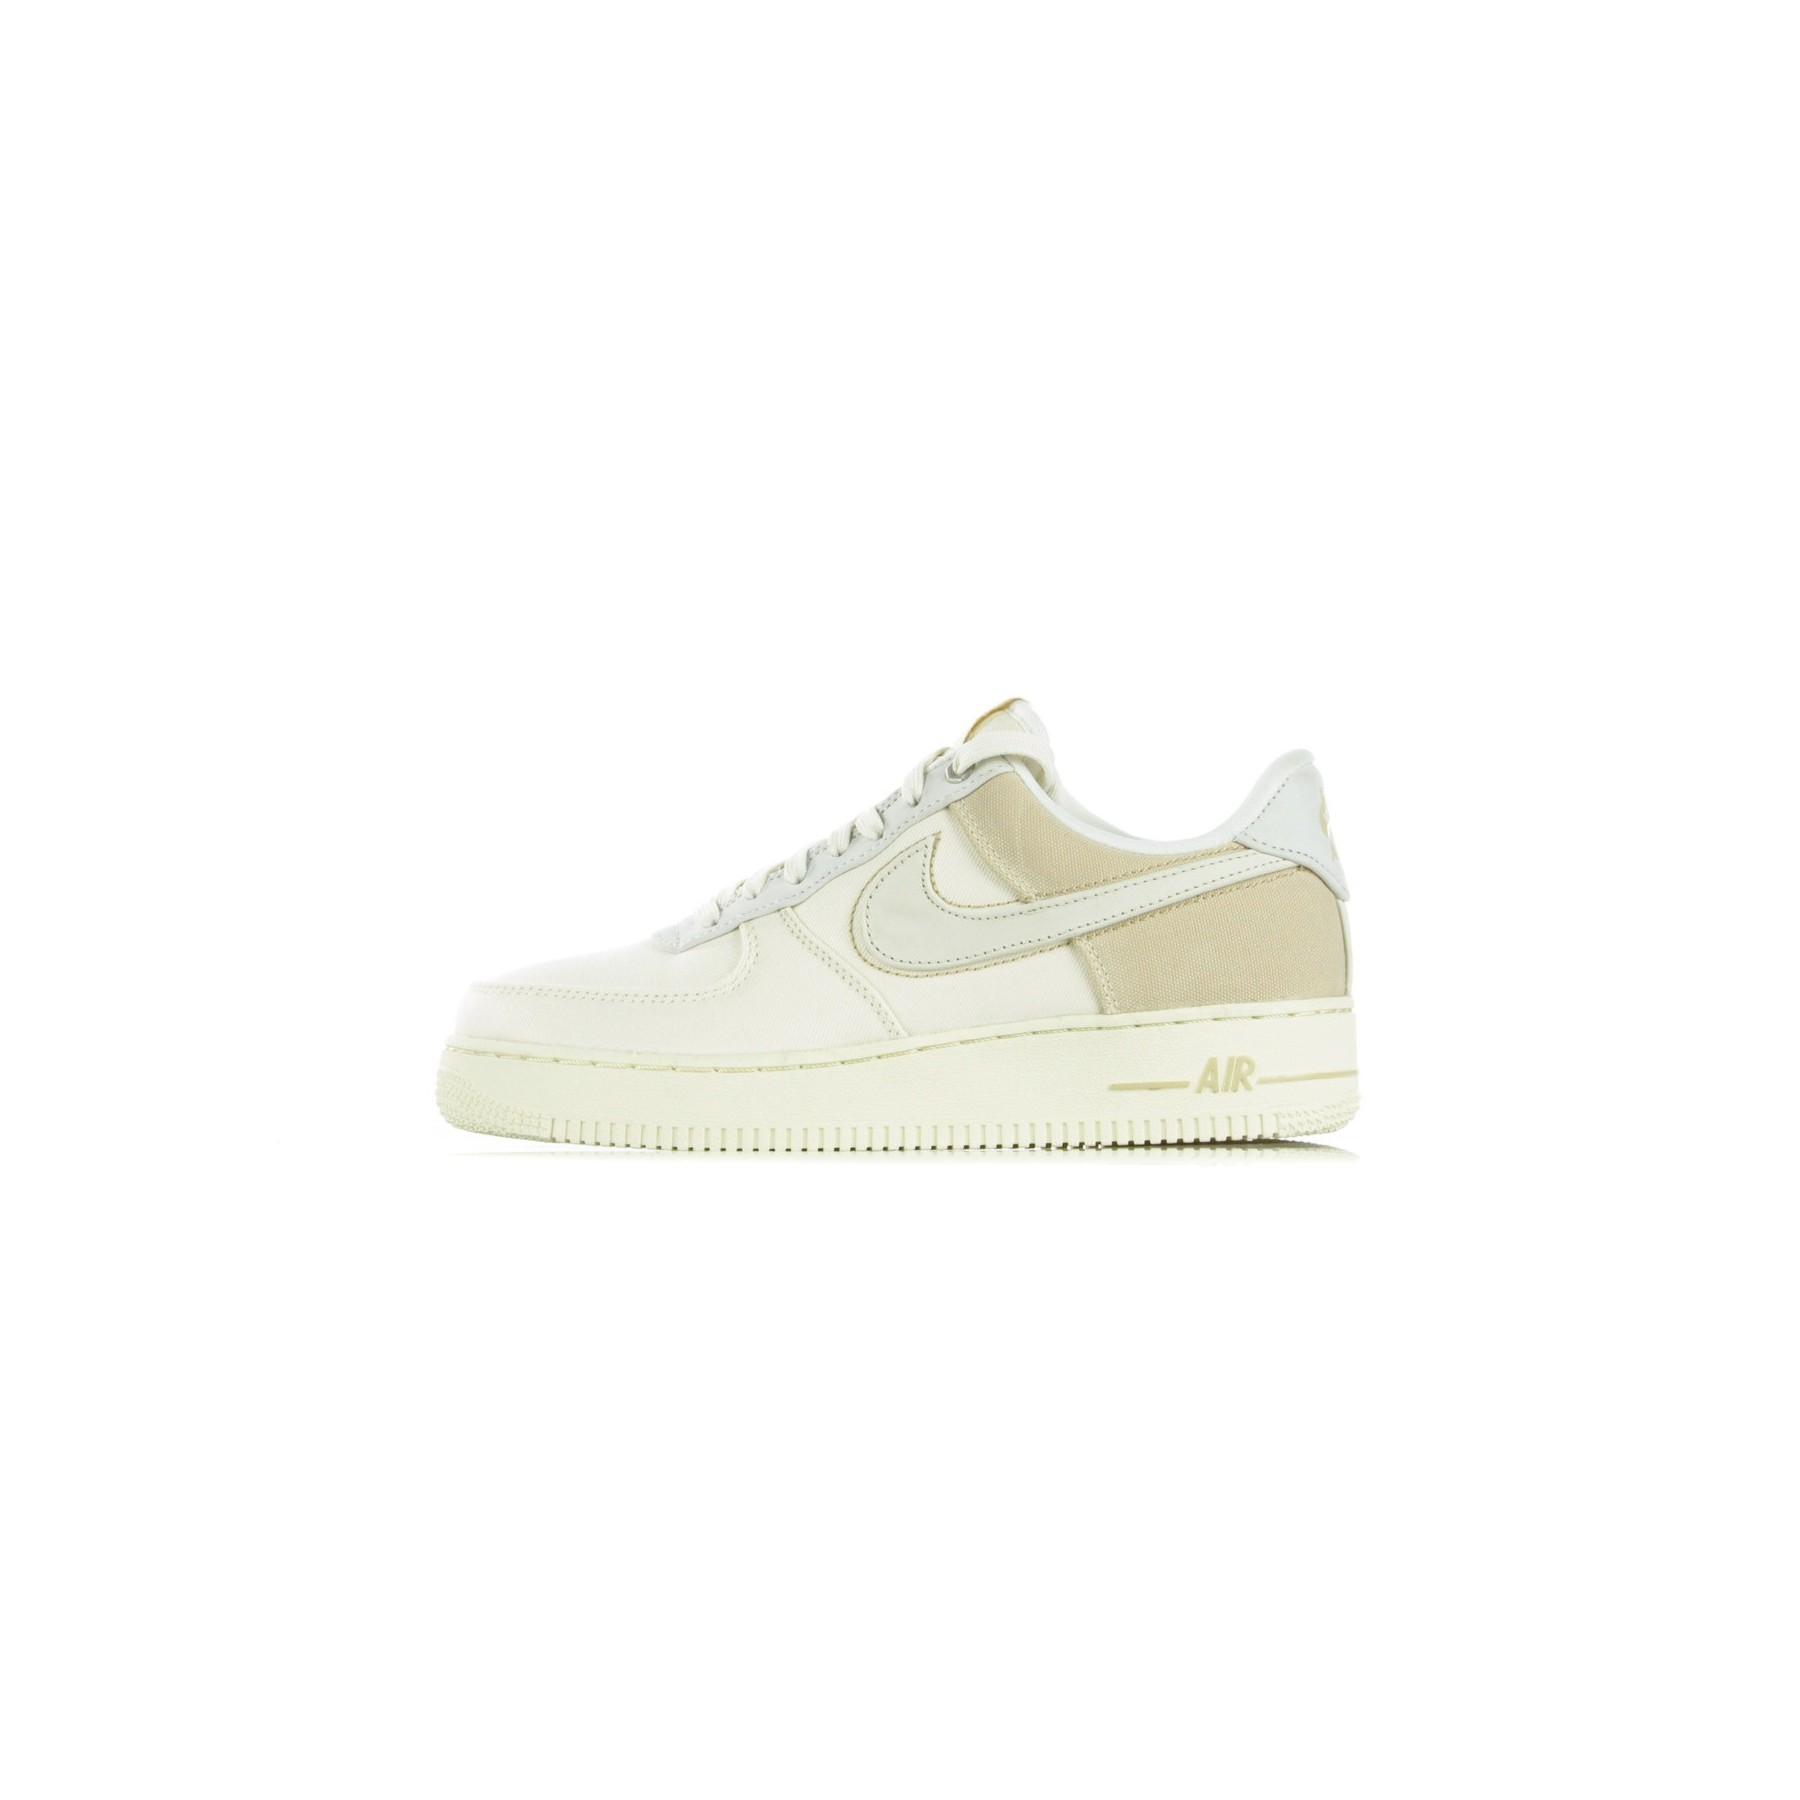 Nike Air Force 1 Low '07 Premium Pale Ivory